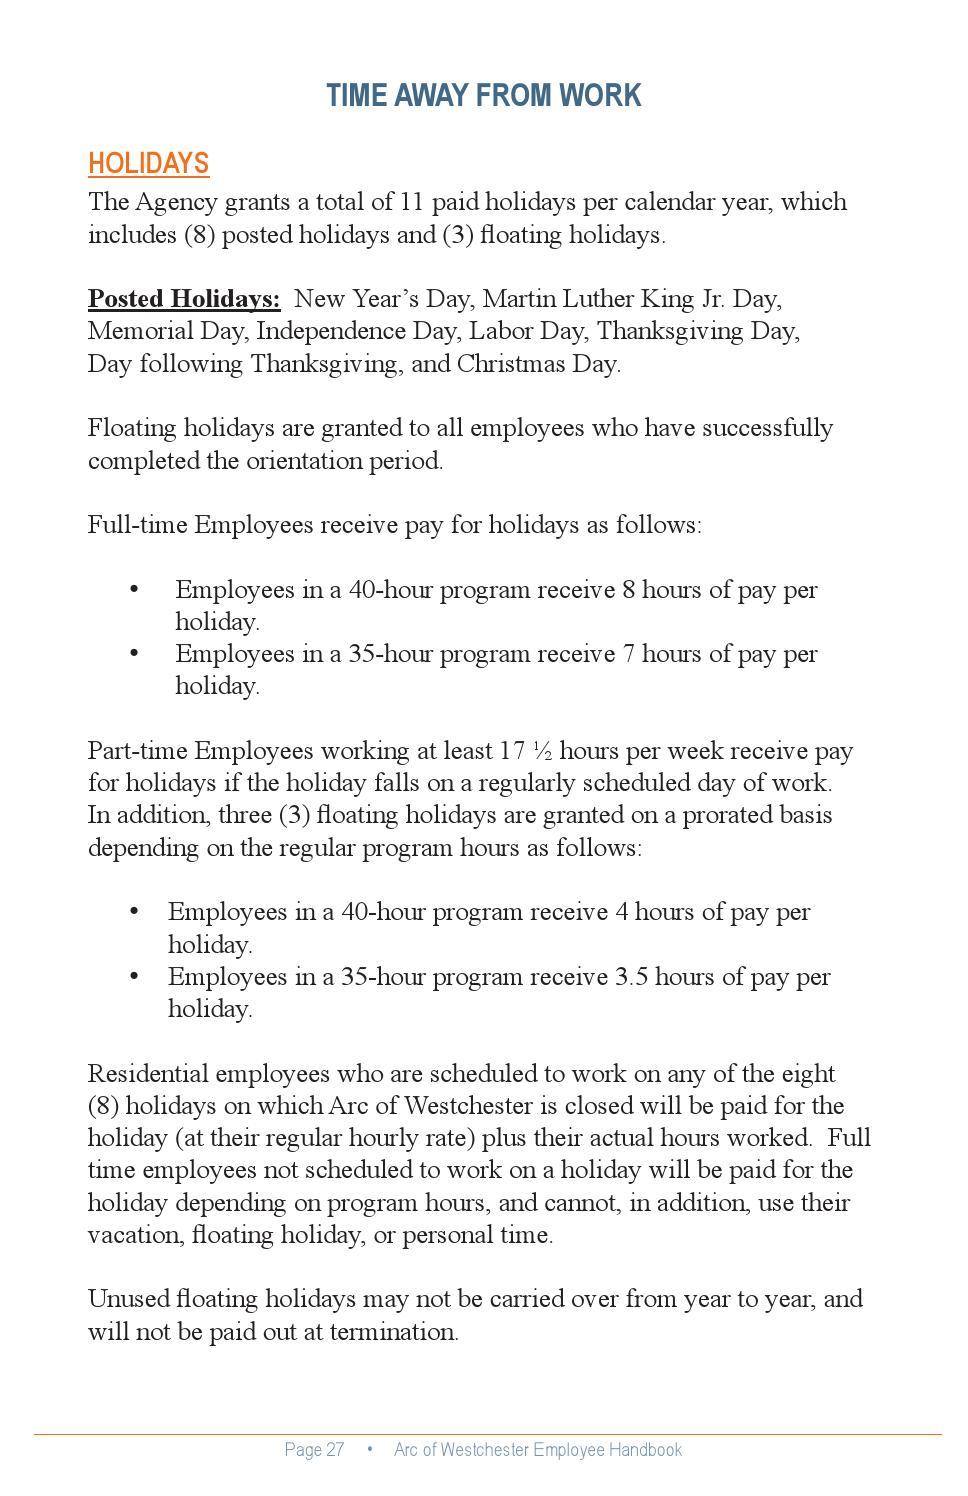 Employee Handbook 2015 by The Arc Westchester - issuu